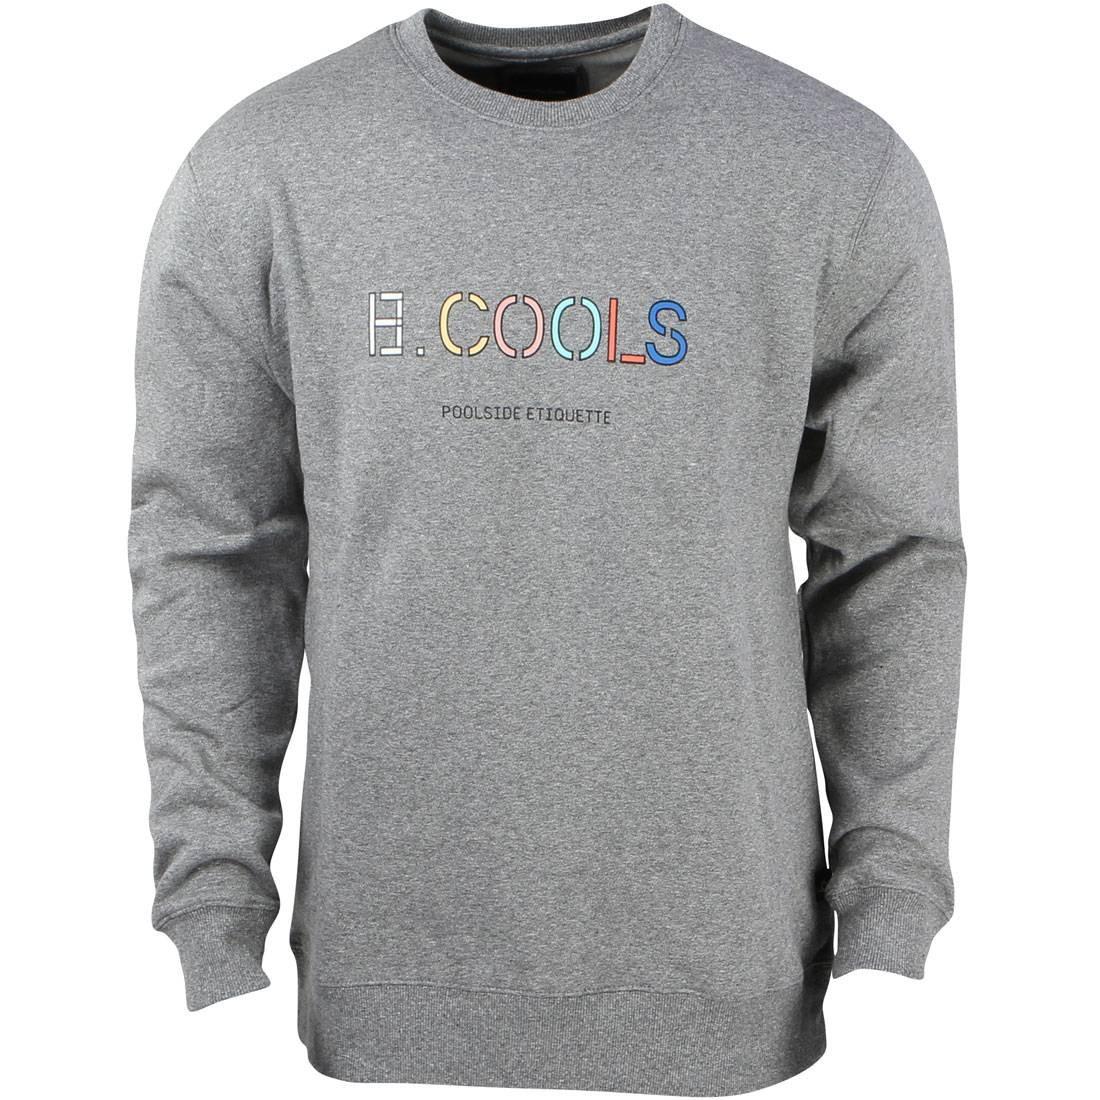 Barney Cools Men 90s Cools Crew Sweater (gray / melange)